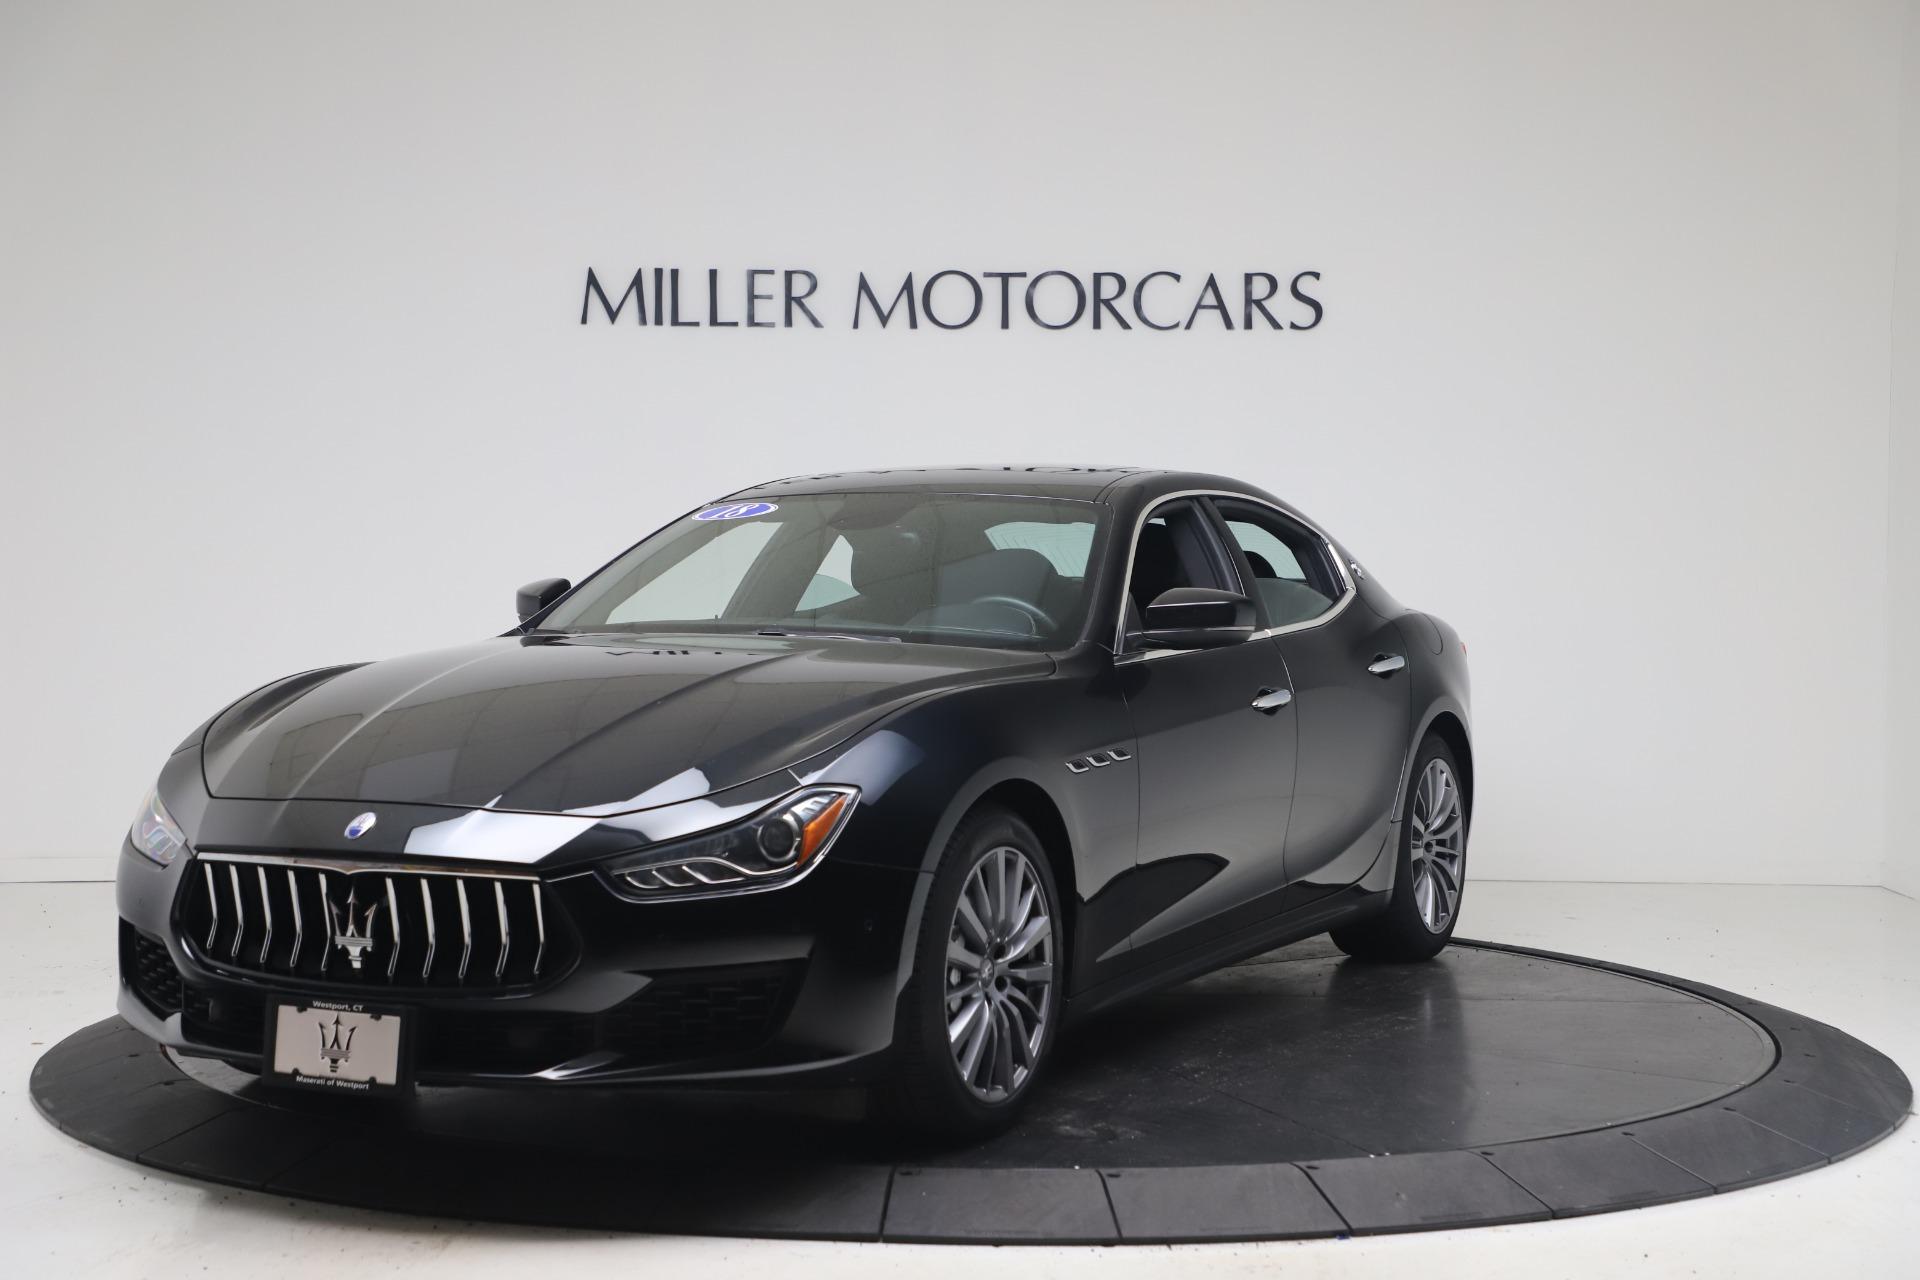 Used 2018 Maserati Ghibli SQ4 for sale $54,900 at McLaren Greenwich in Greenwich CT 06830 1